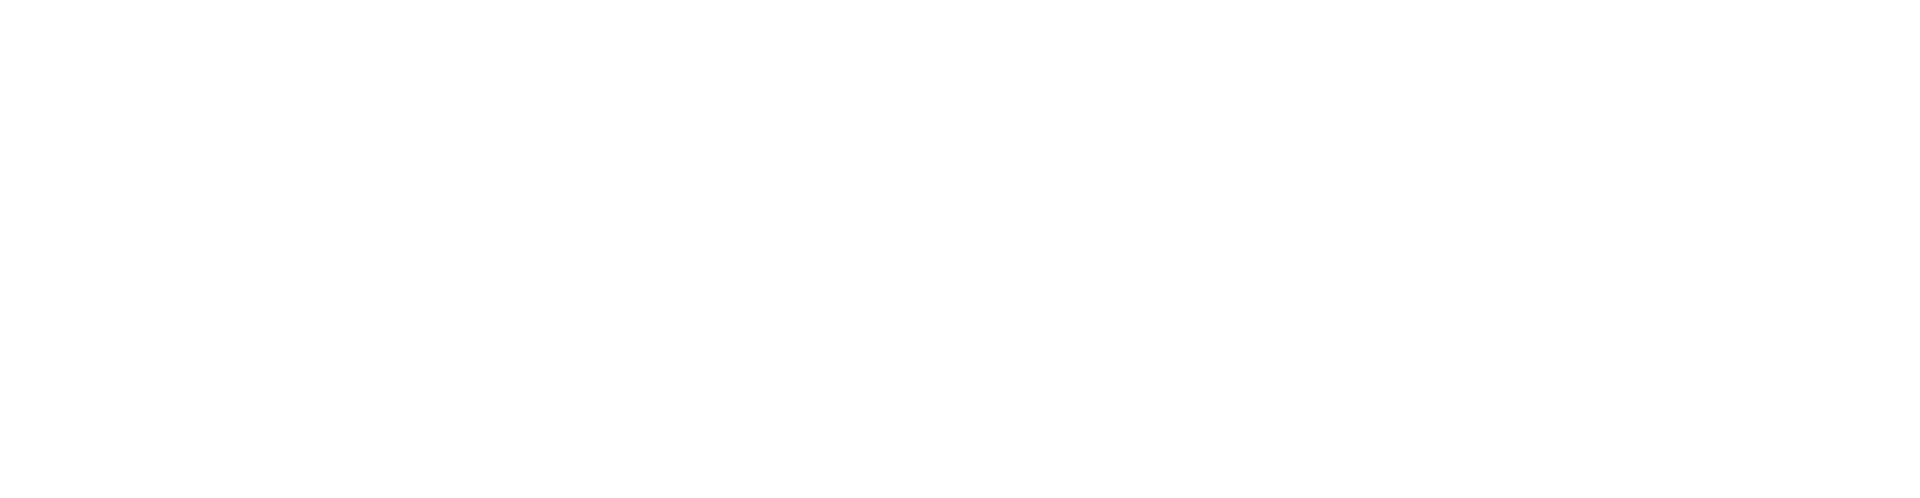 barra-separa-informacoes.png